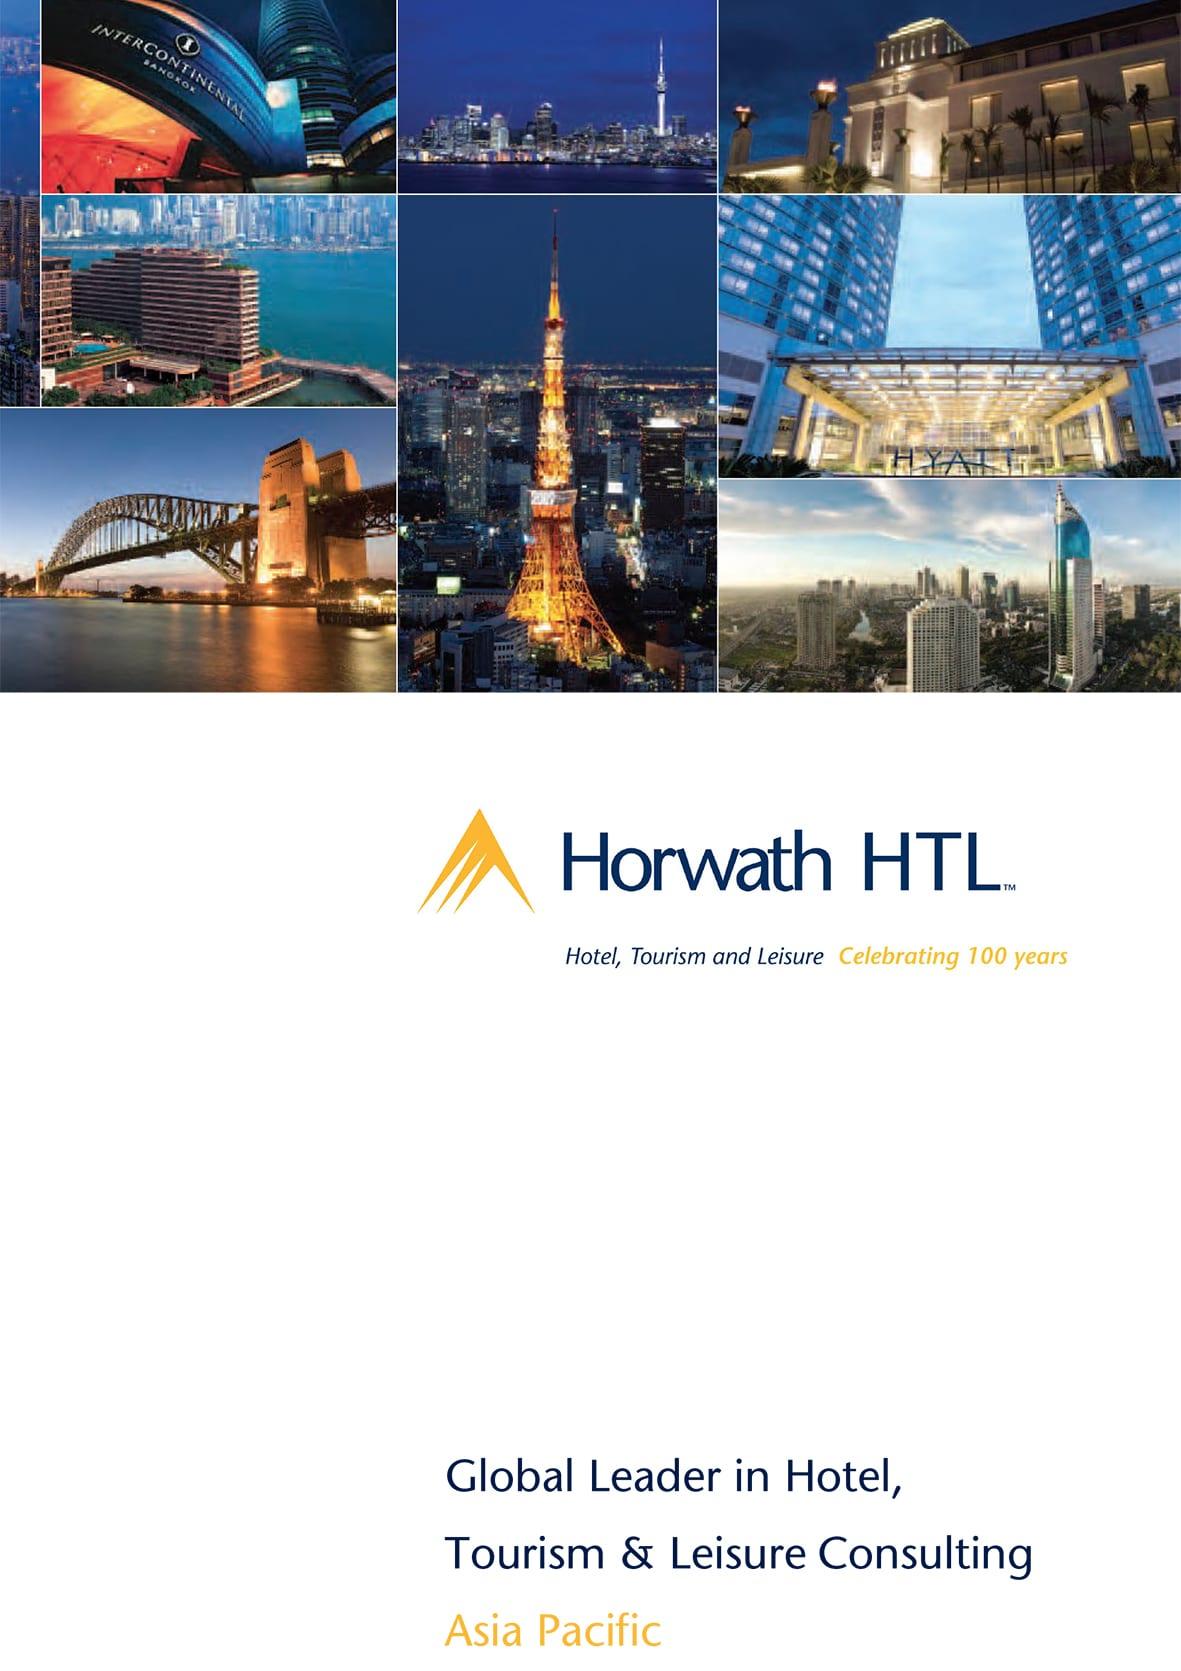 HorwathHTL ASIA PAC250615 1